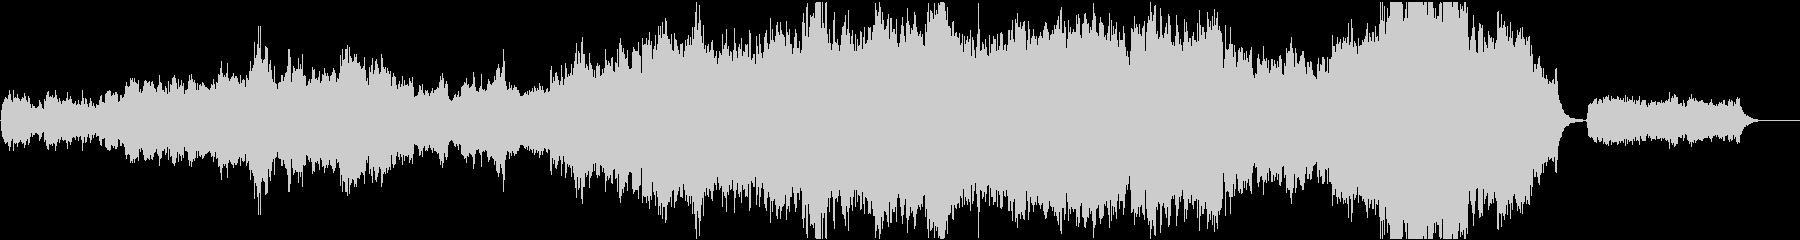 16bit,48kHzバージョンです。の未再生の波形